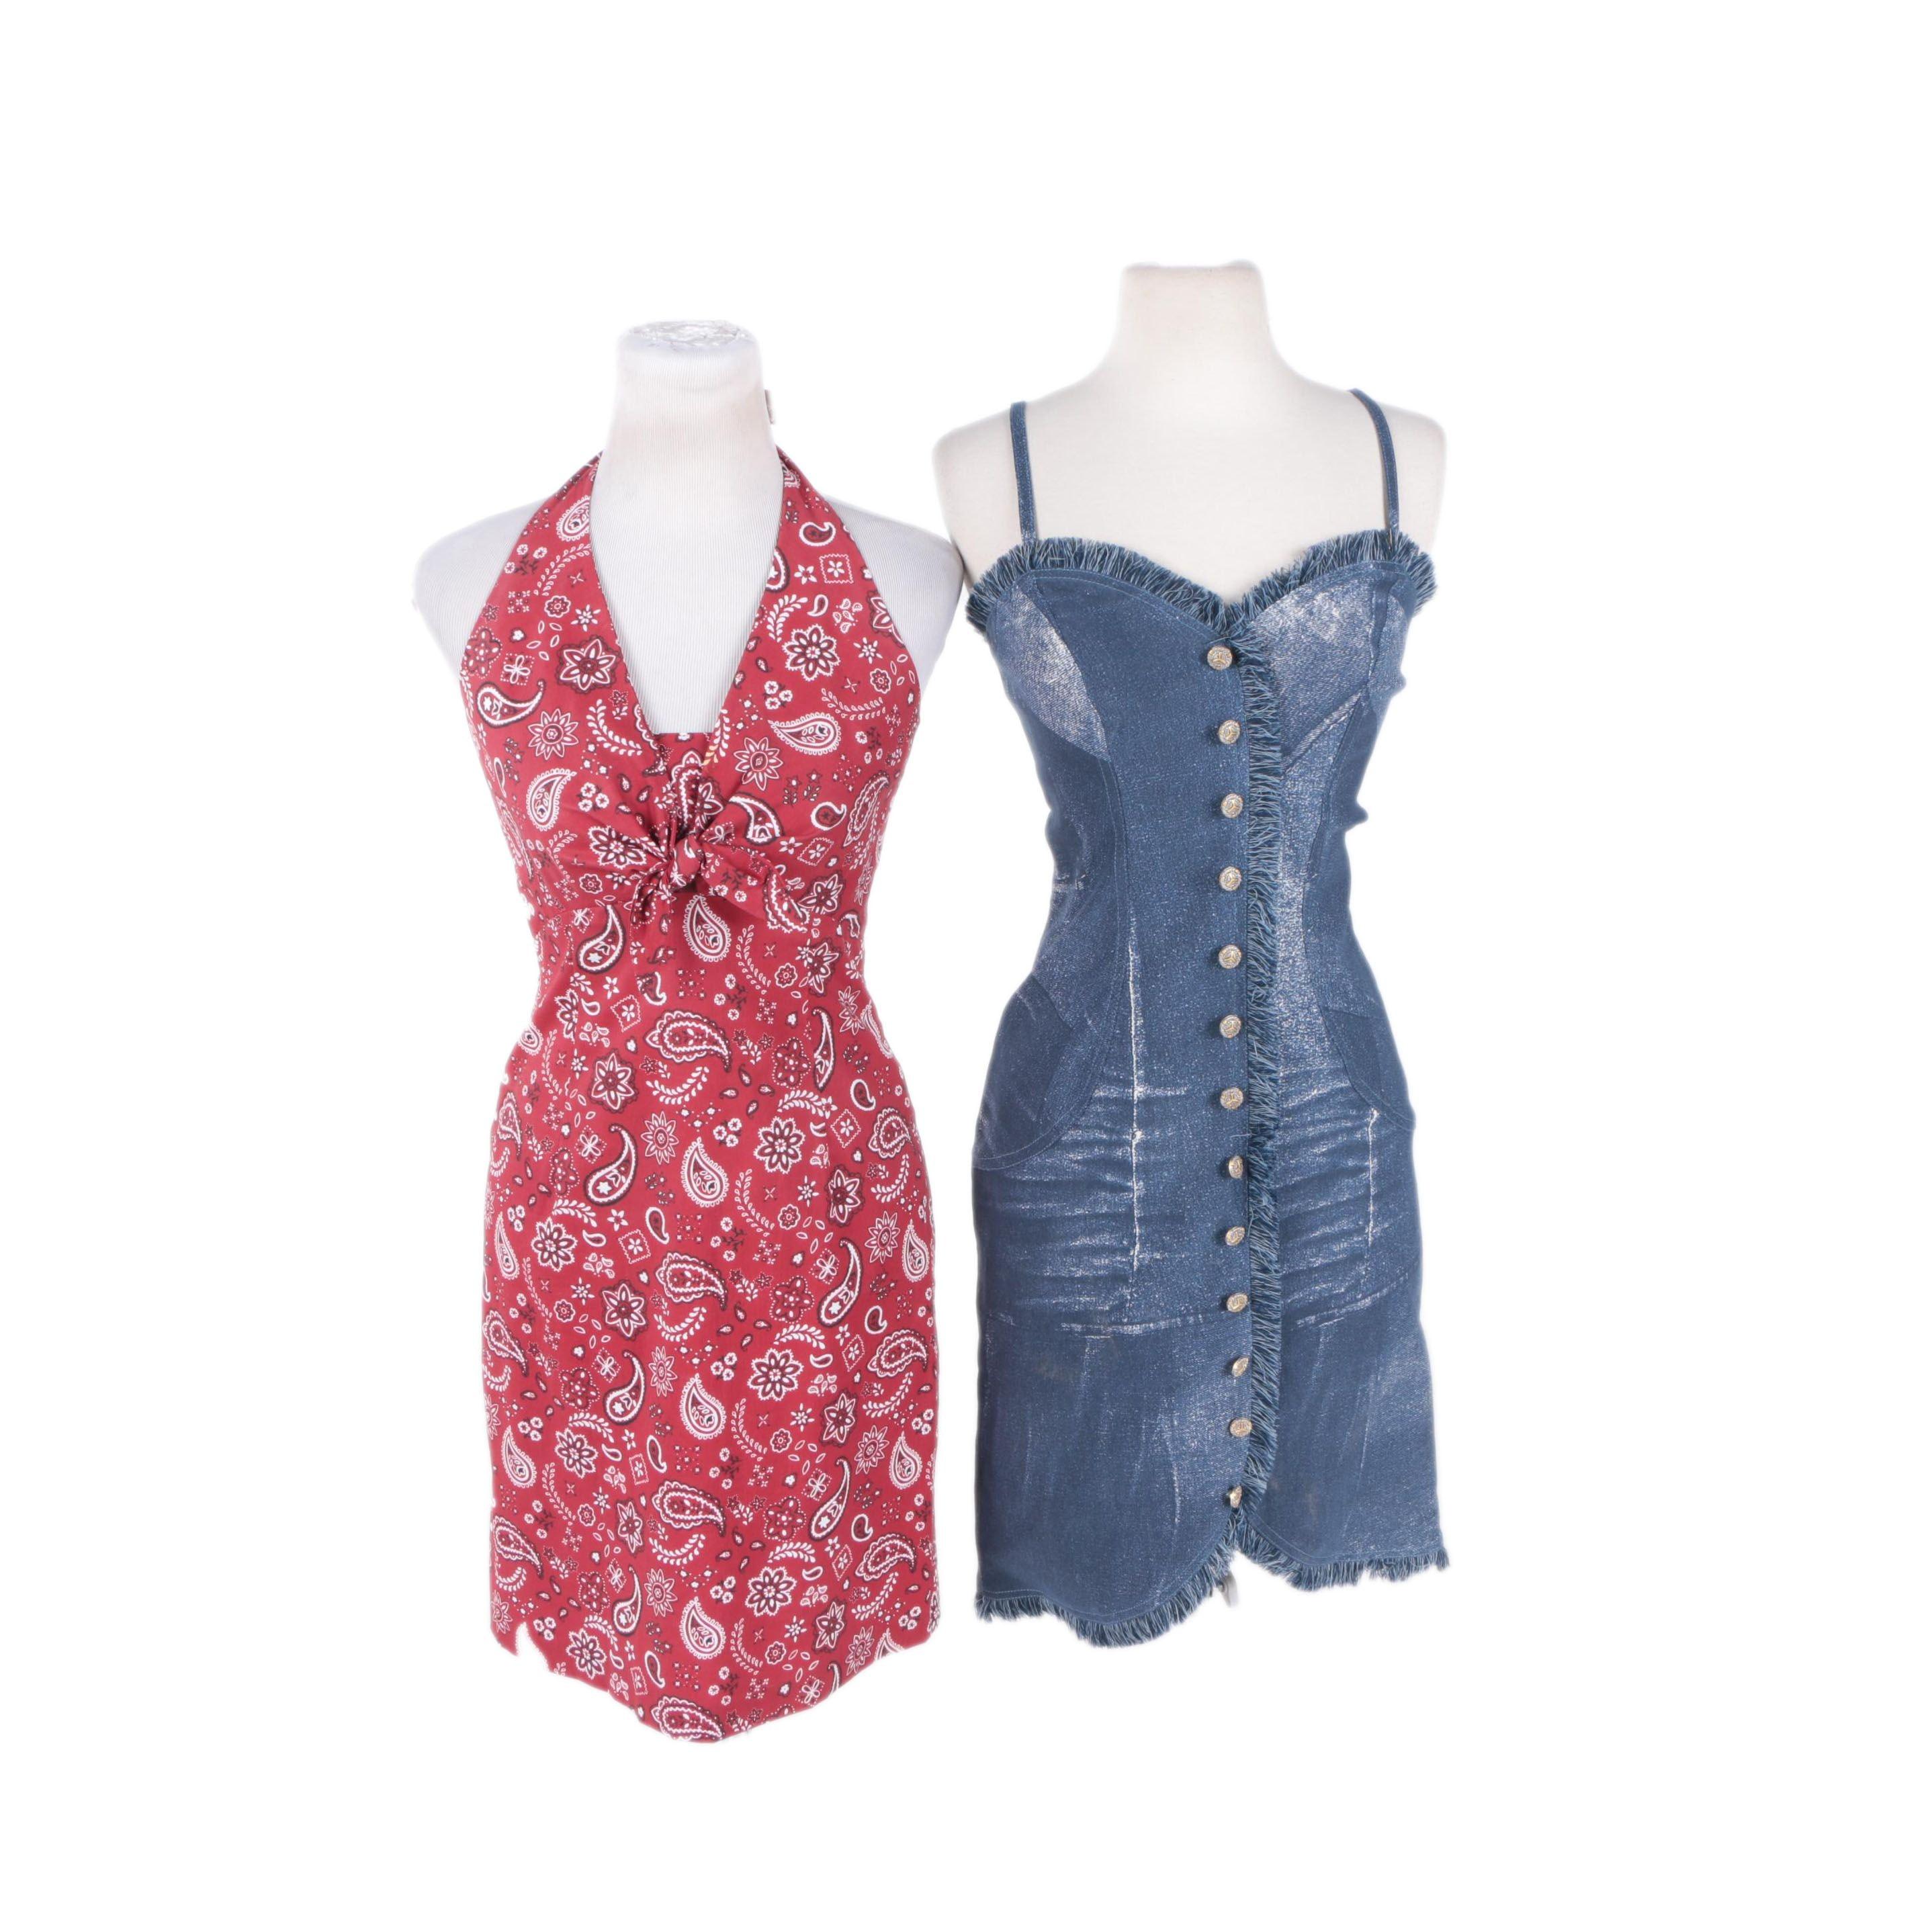 Women's Printed Dresses Including Jiki